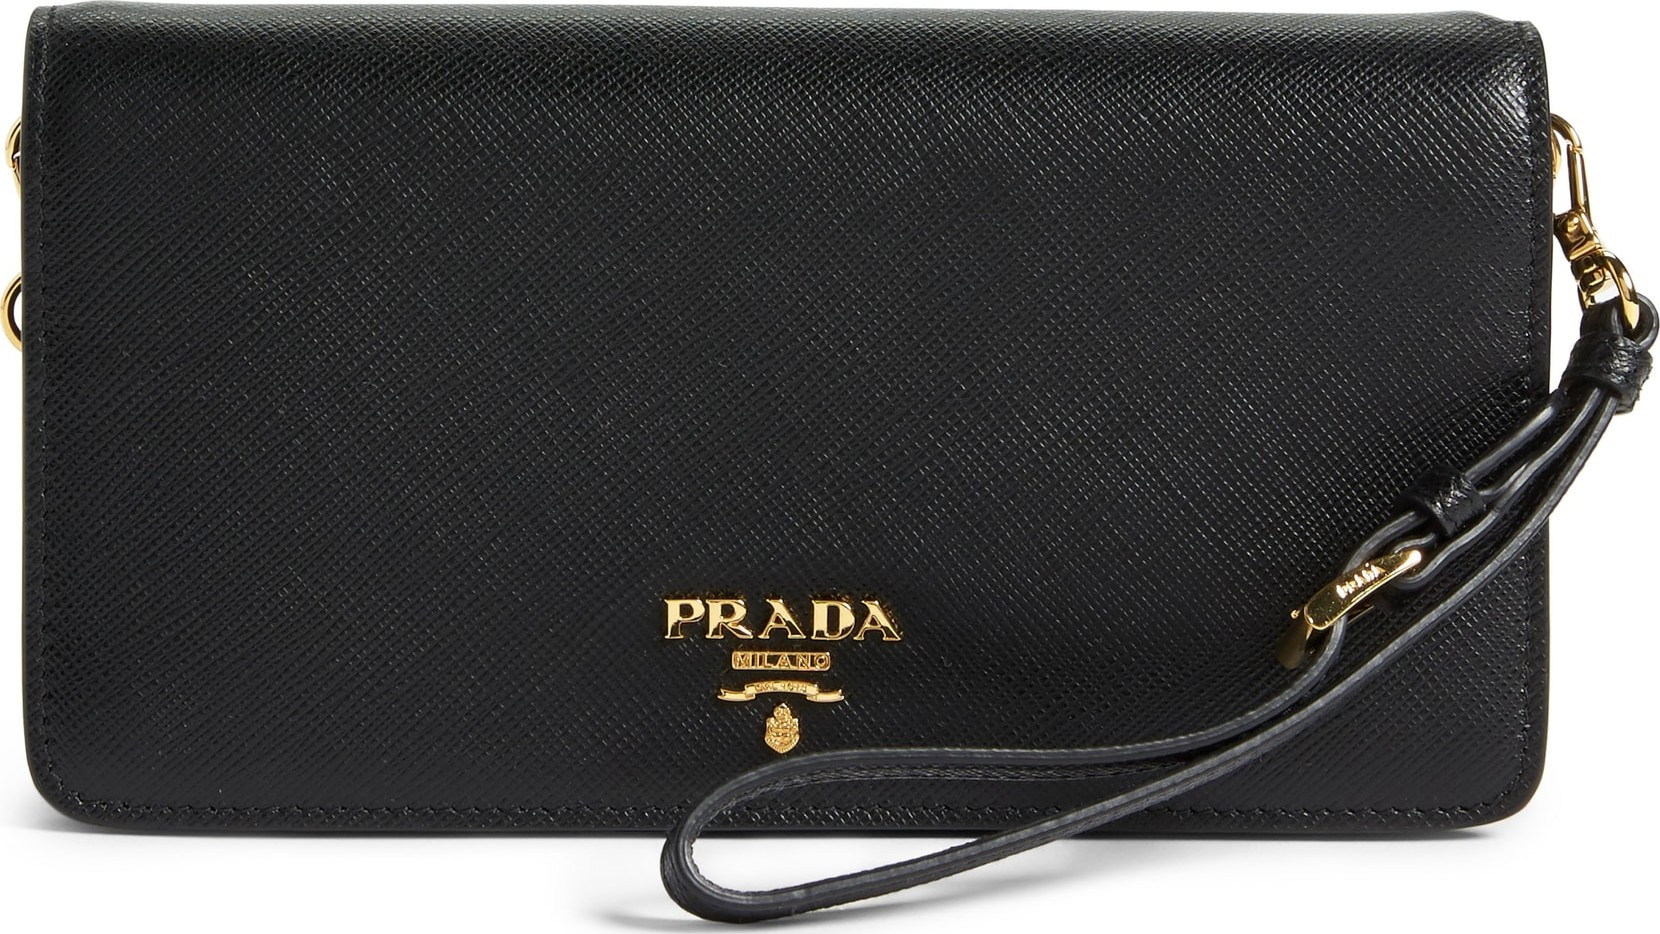 fdd2122d8c11c3 ... uk prada saffiano metal oro flap wallet on a chain 0a56c 4b008 ...